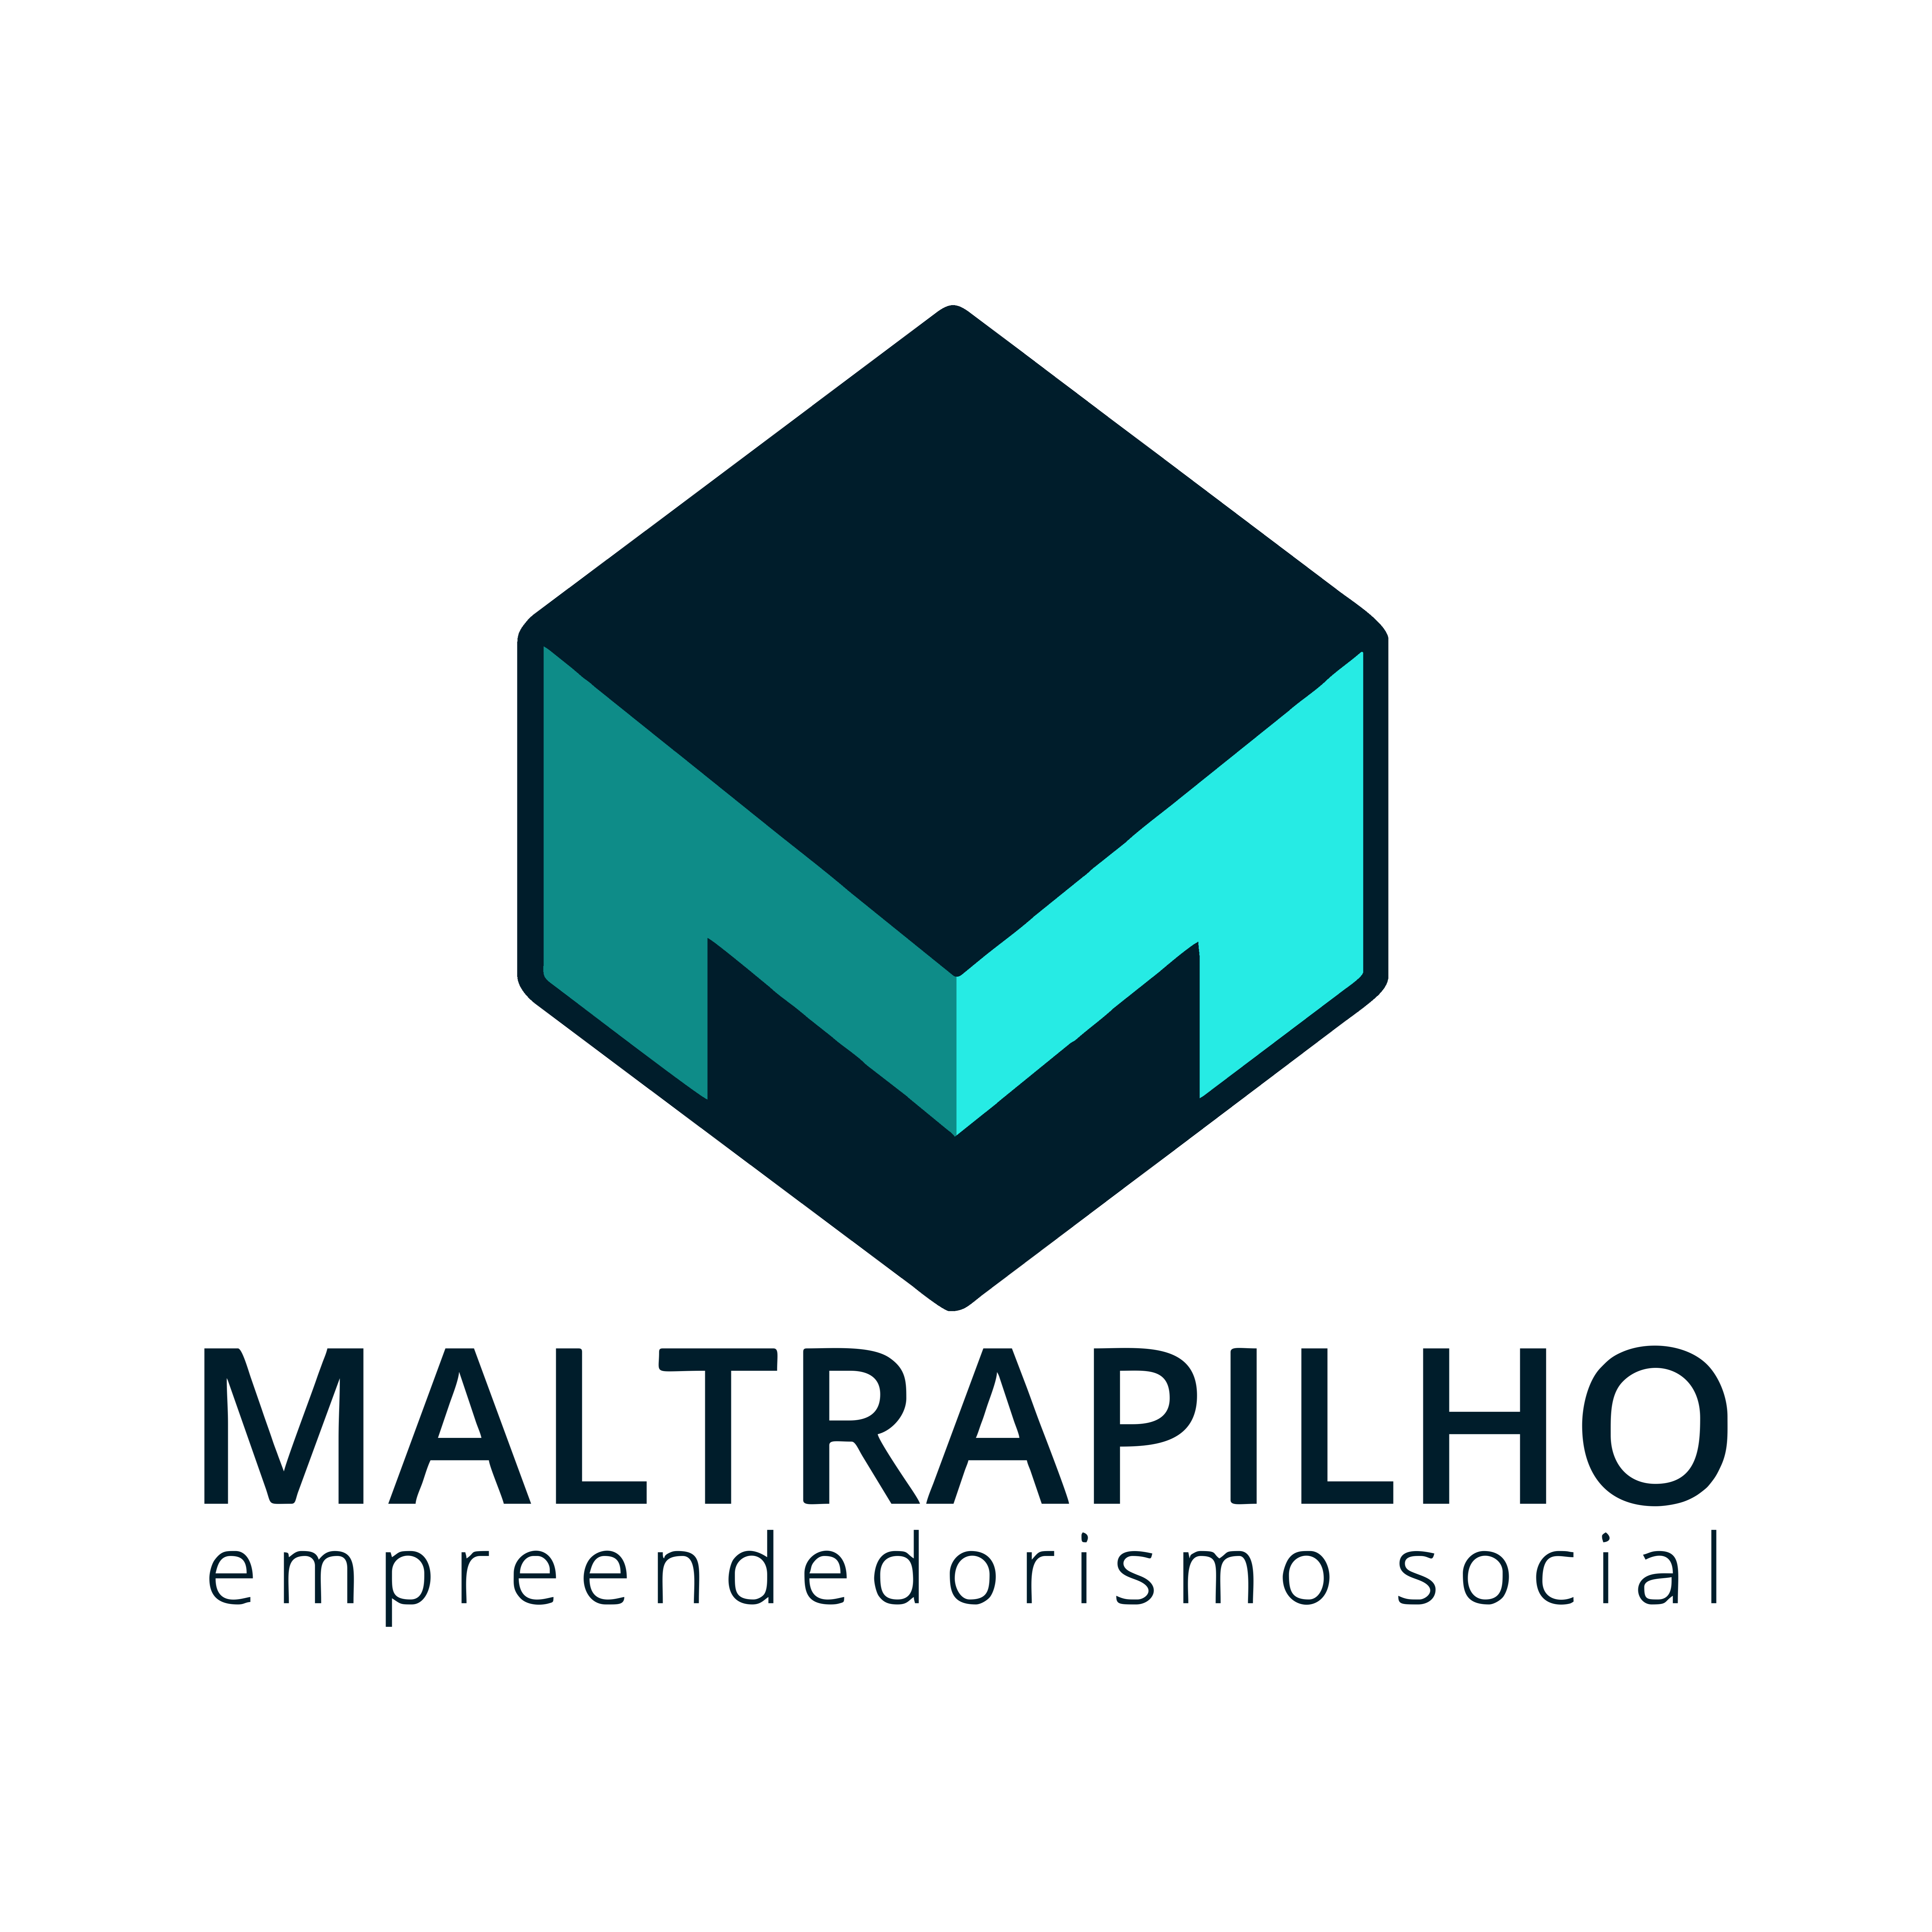 PROJETO MALTRAPILHO (projetomaltrapilho) Profile Image   Linktree